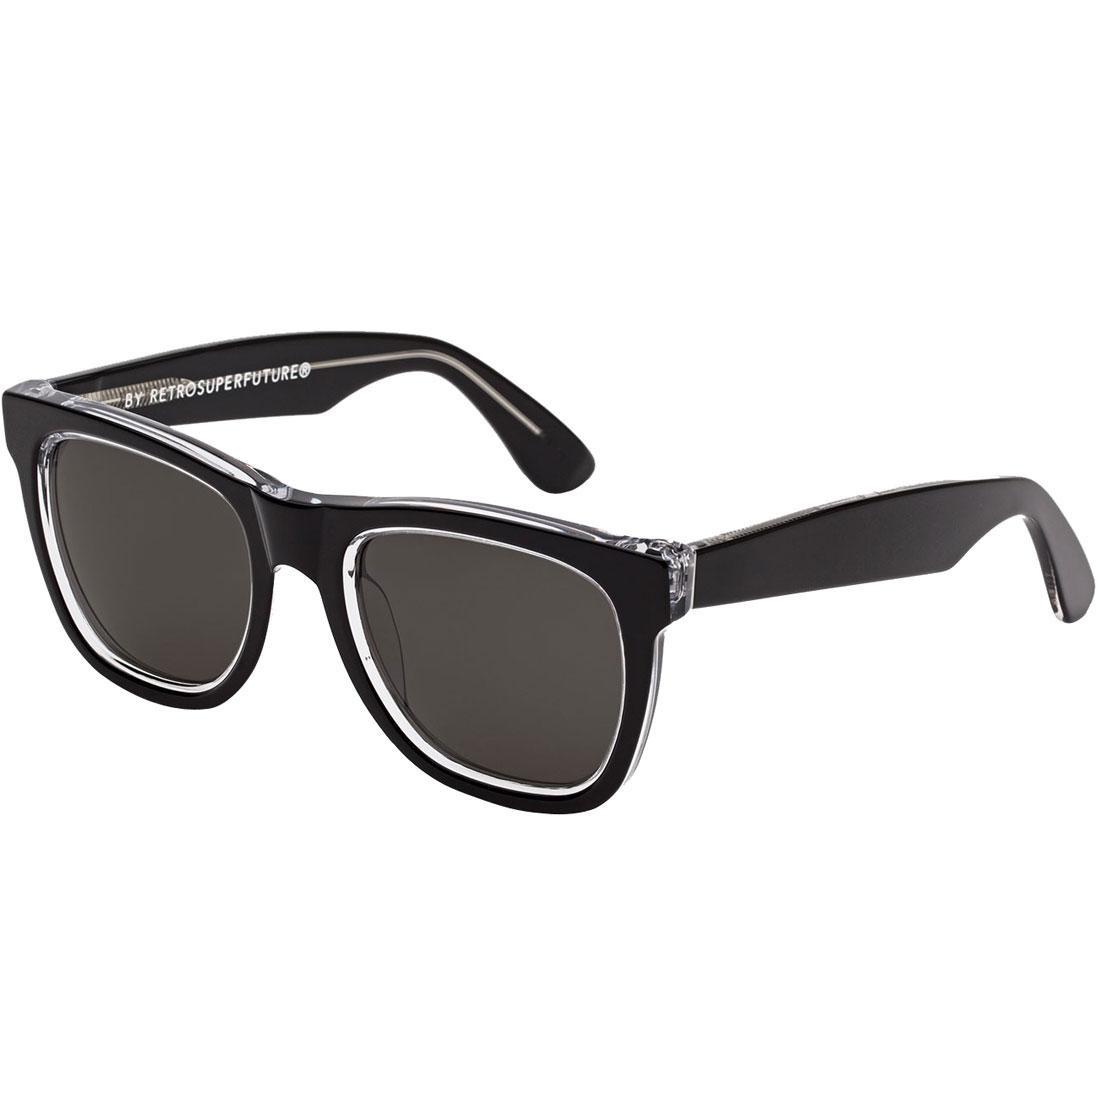 Super Sunglasses Classic Acrhomatic Sunglasses (black)